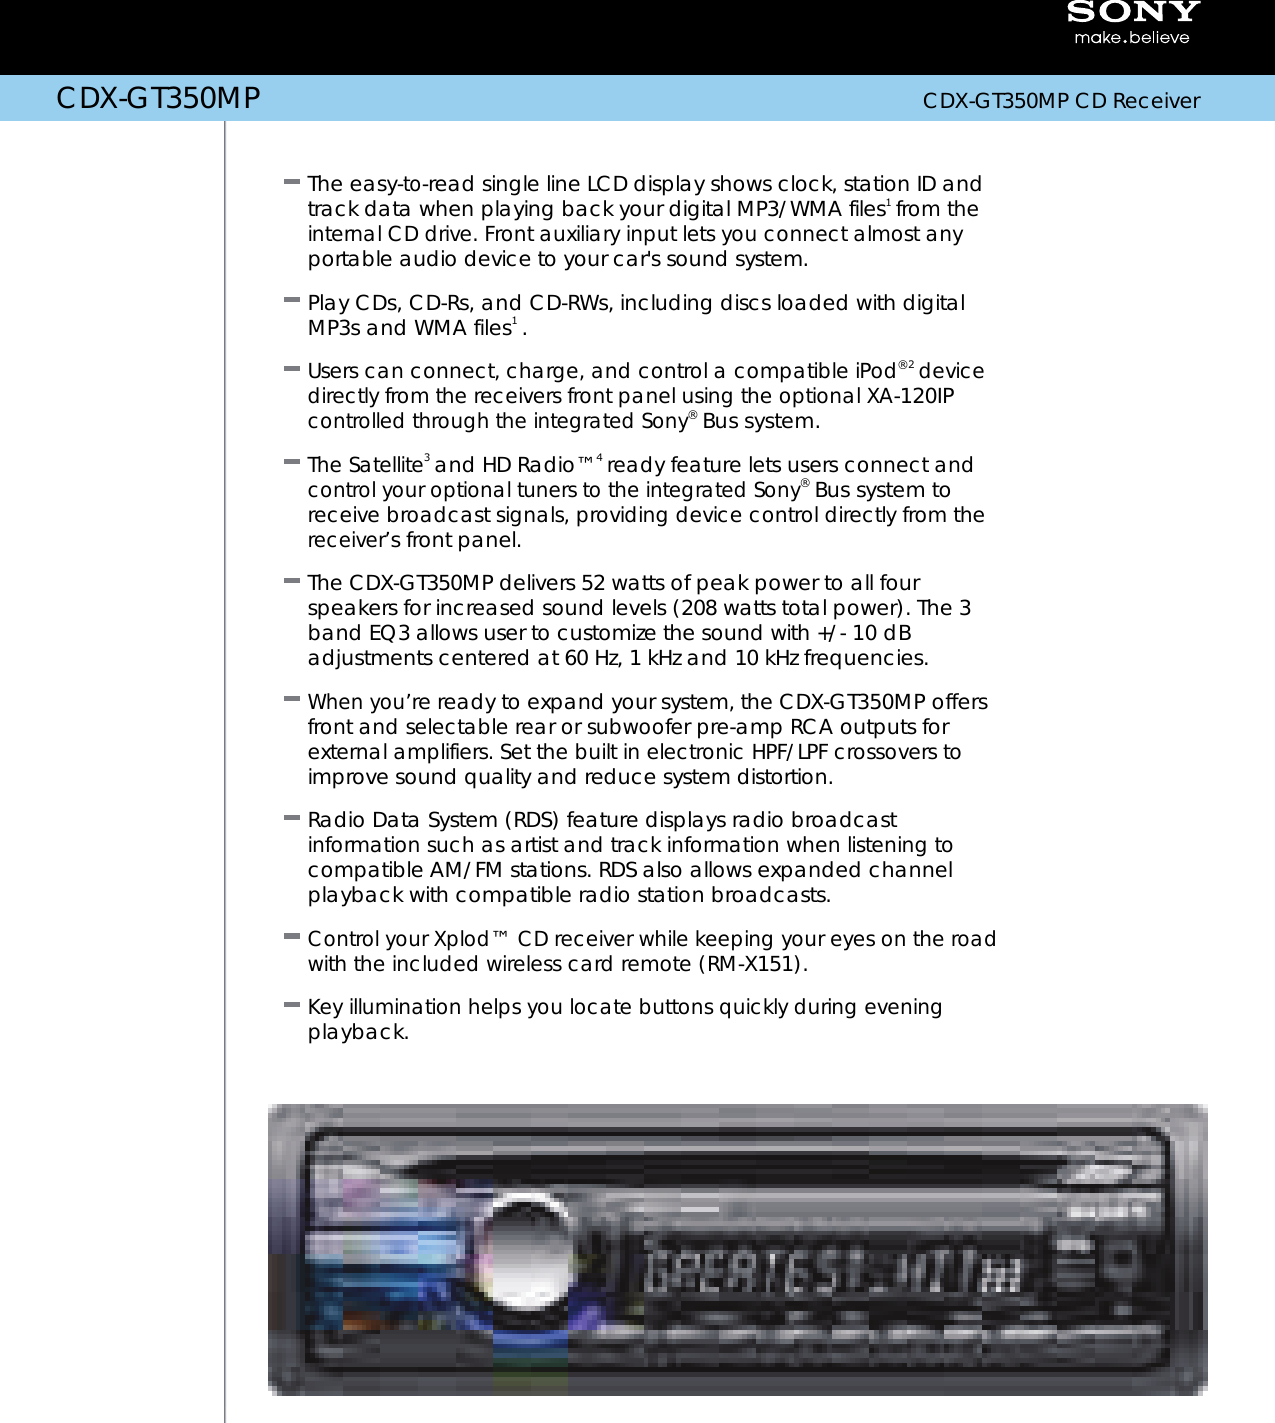 sony cdx gt350mp users manual  usermanual.wiki